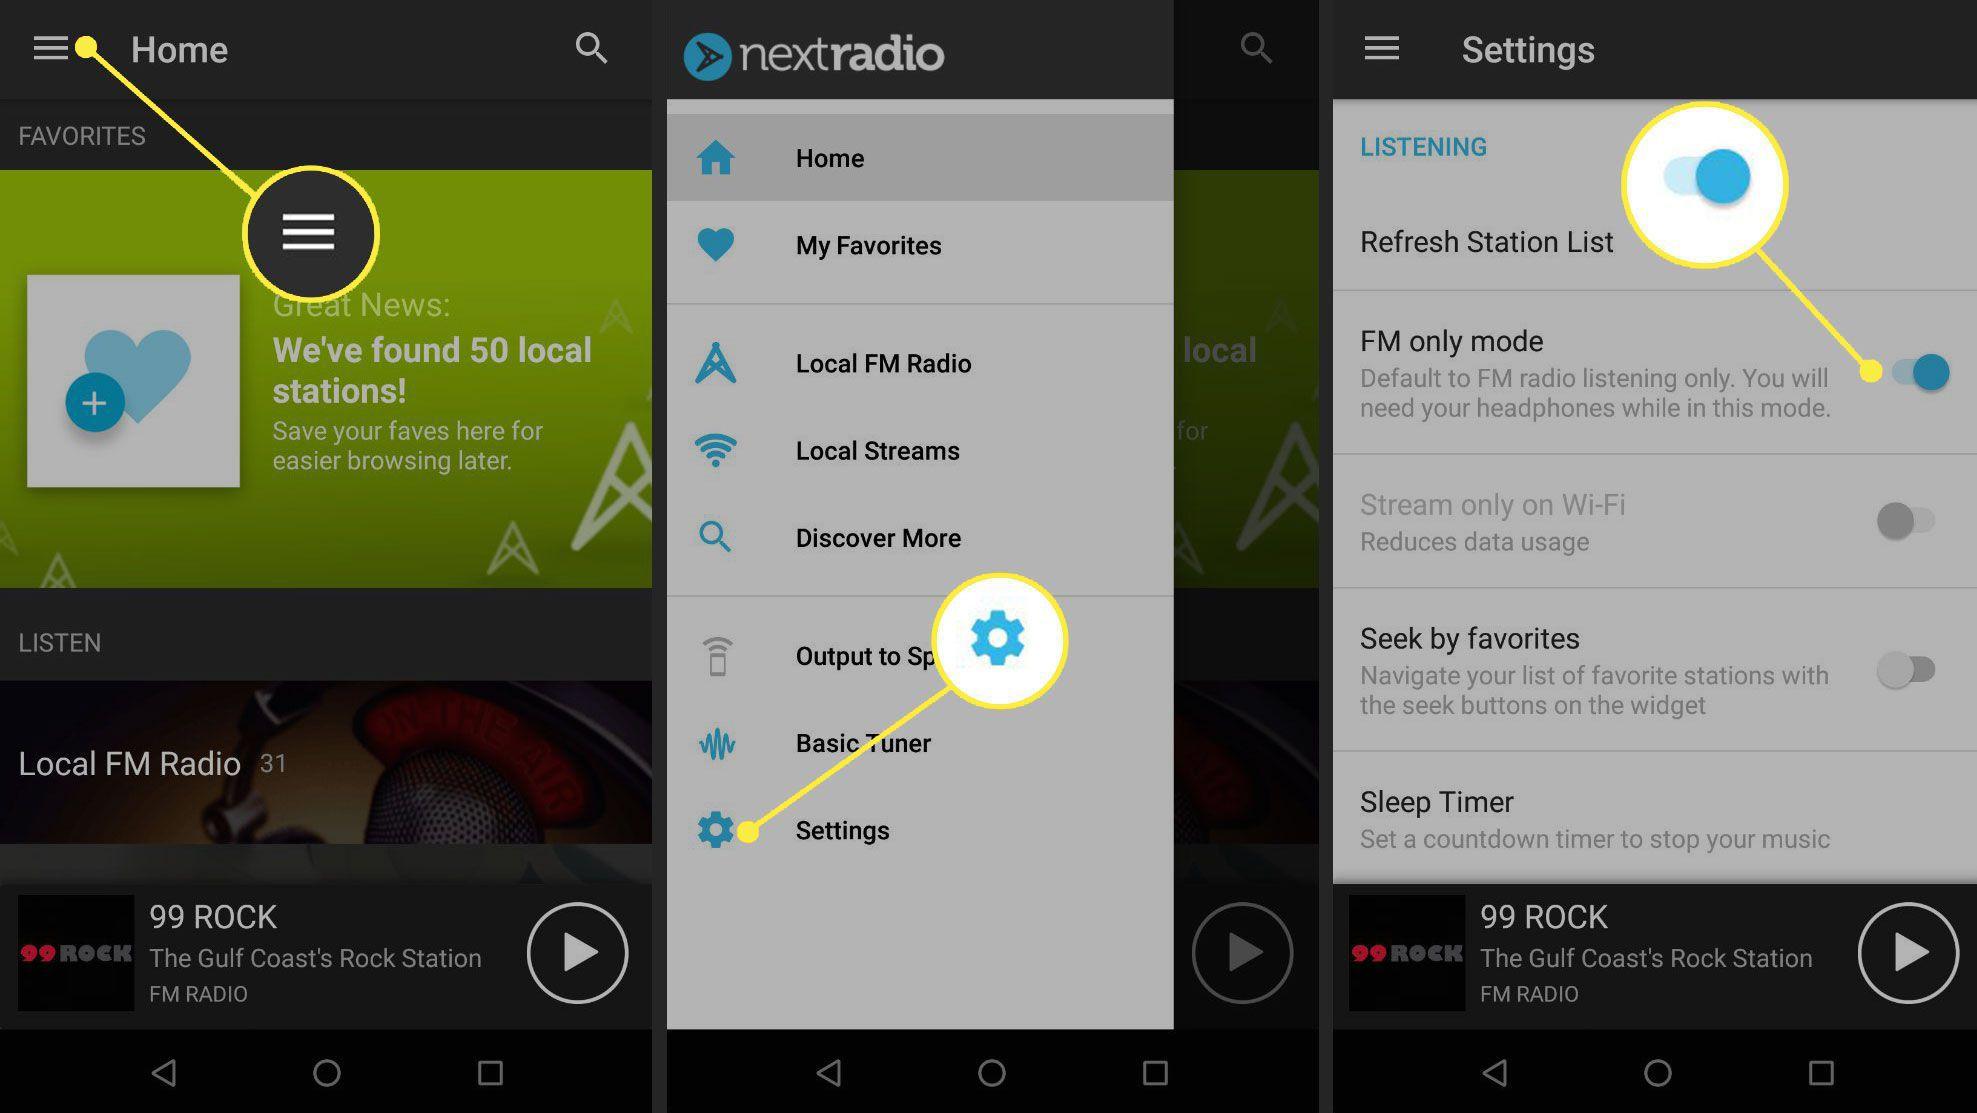 NextRadio settings